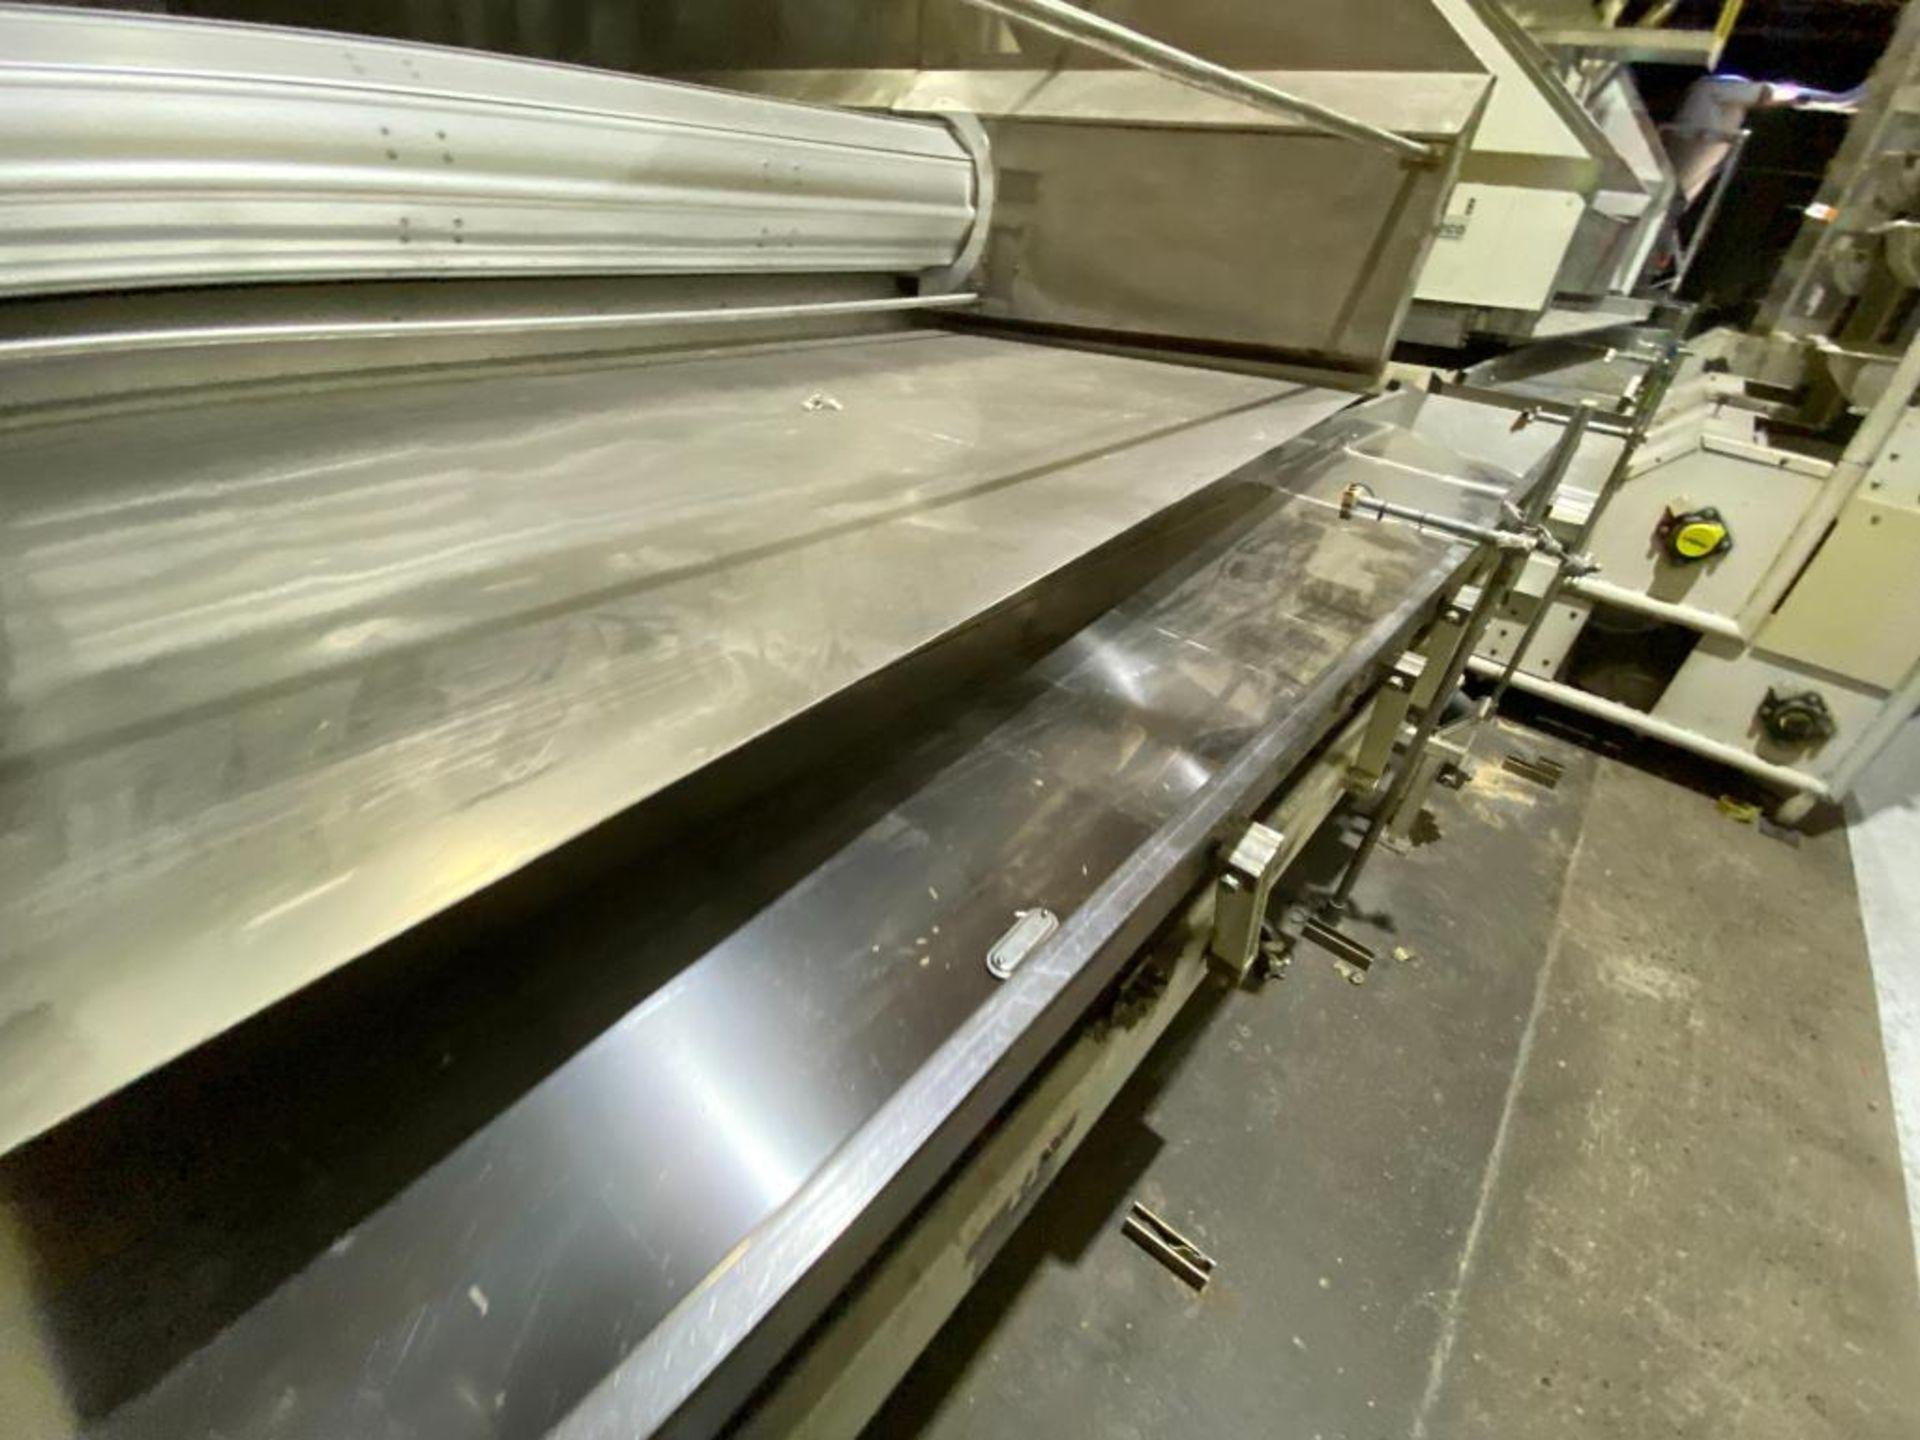 Link Belt vibratory conveyor - Image 2 of 5